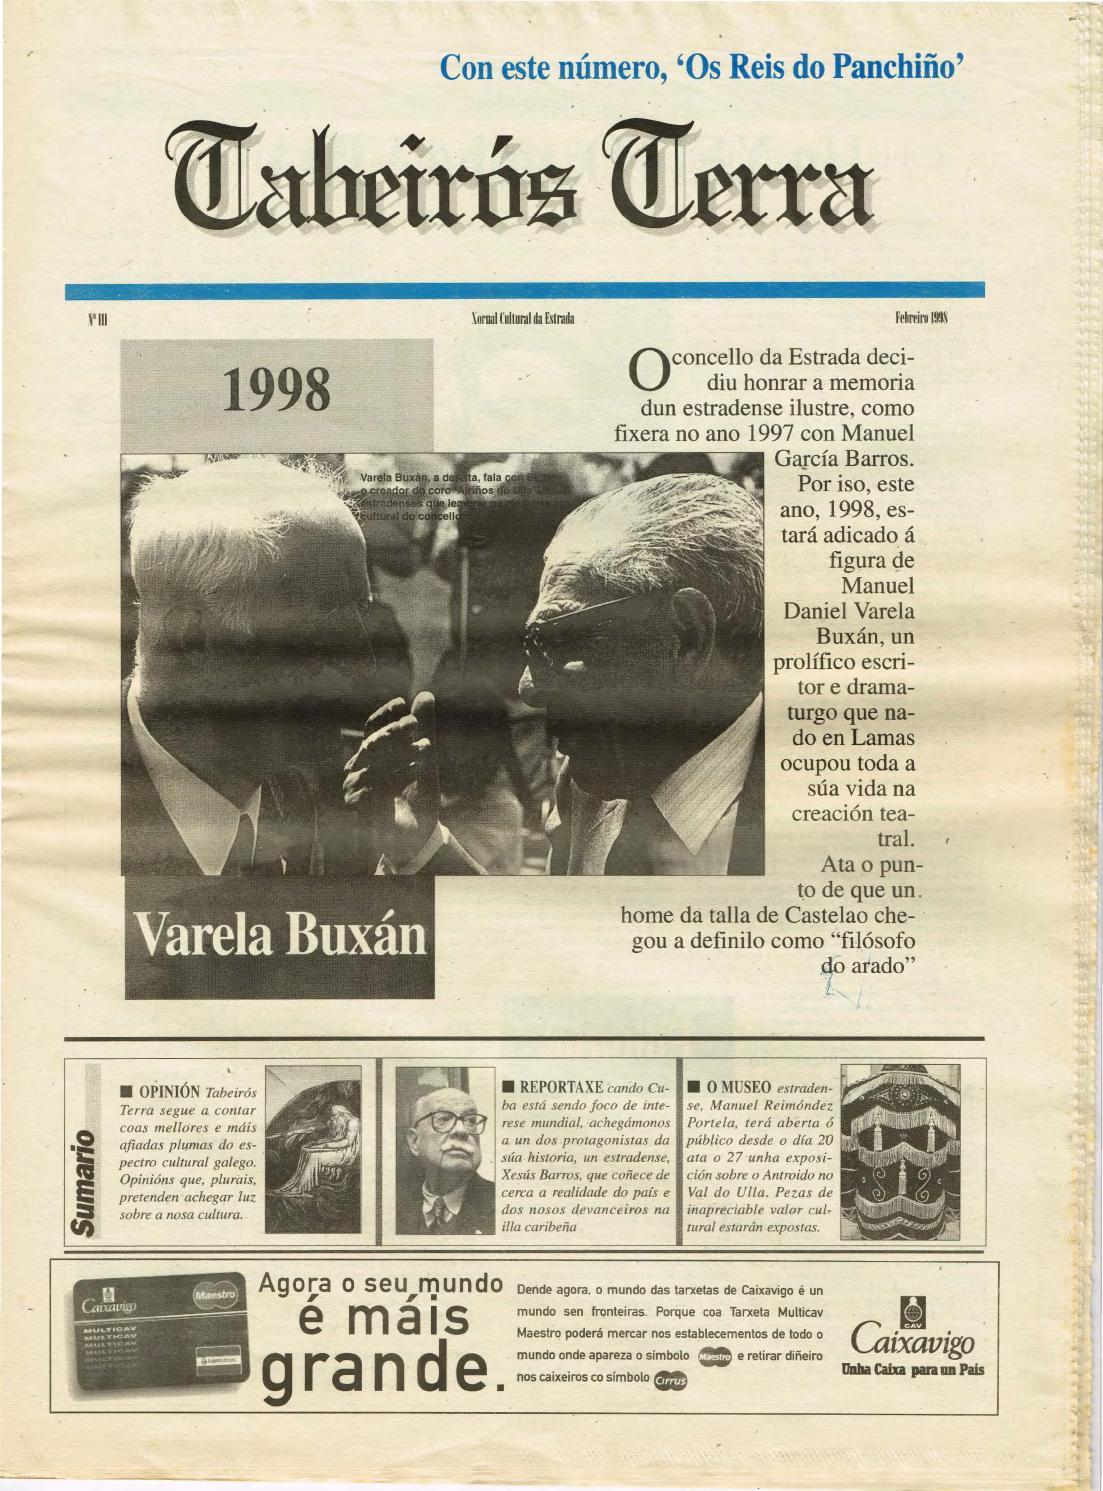 Tabeiros Terra N 3 Febreiro 1998 By Asociaci N Cultural  # Muebles El Zar Toedo